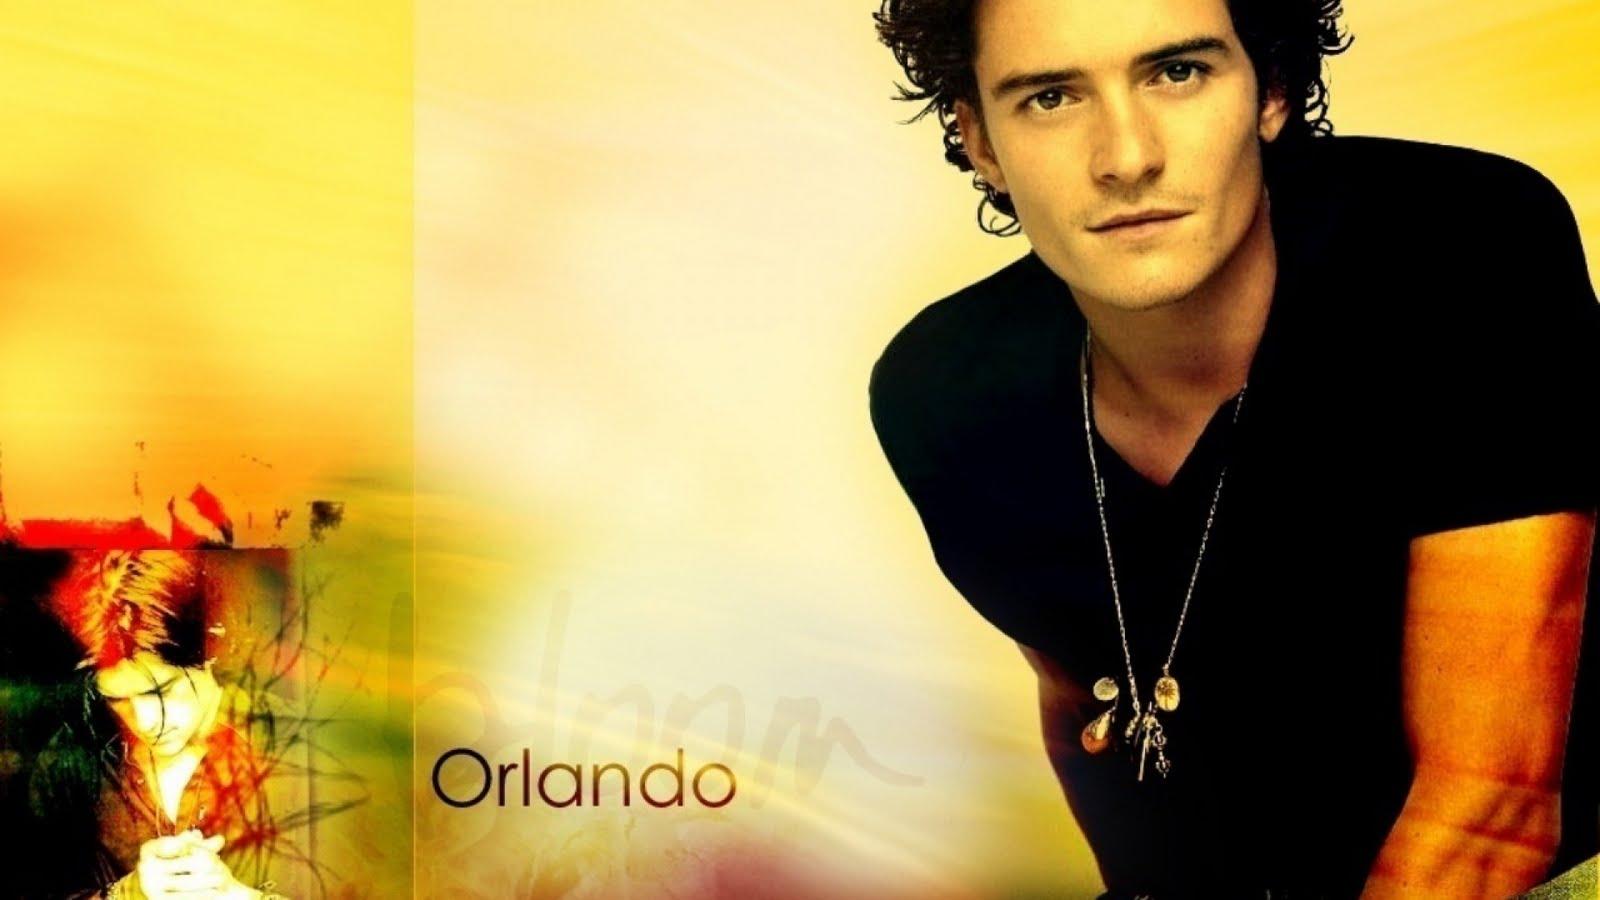 http://3.bp.blogspot.com/-DzEjlu96SVQ/Tj0_pGW4ufI/AAAAAAAAAIE/Kq4OUE577qk/s1600/Ornlando-Bloom-orlando-bloom-actor-boys-262e903b81-1920x1080.jpg